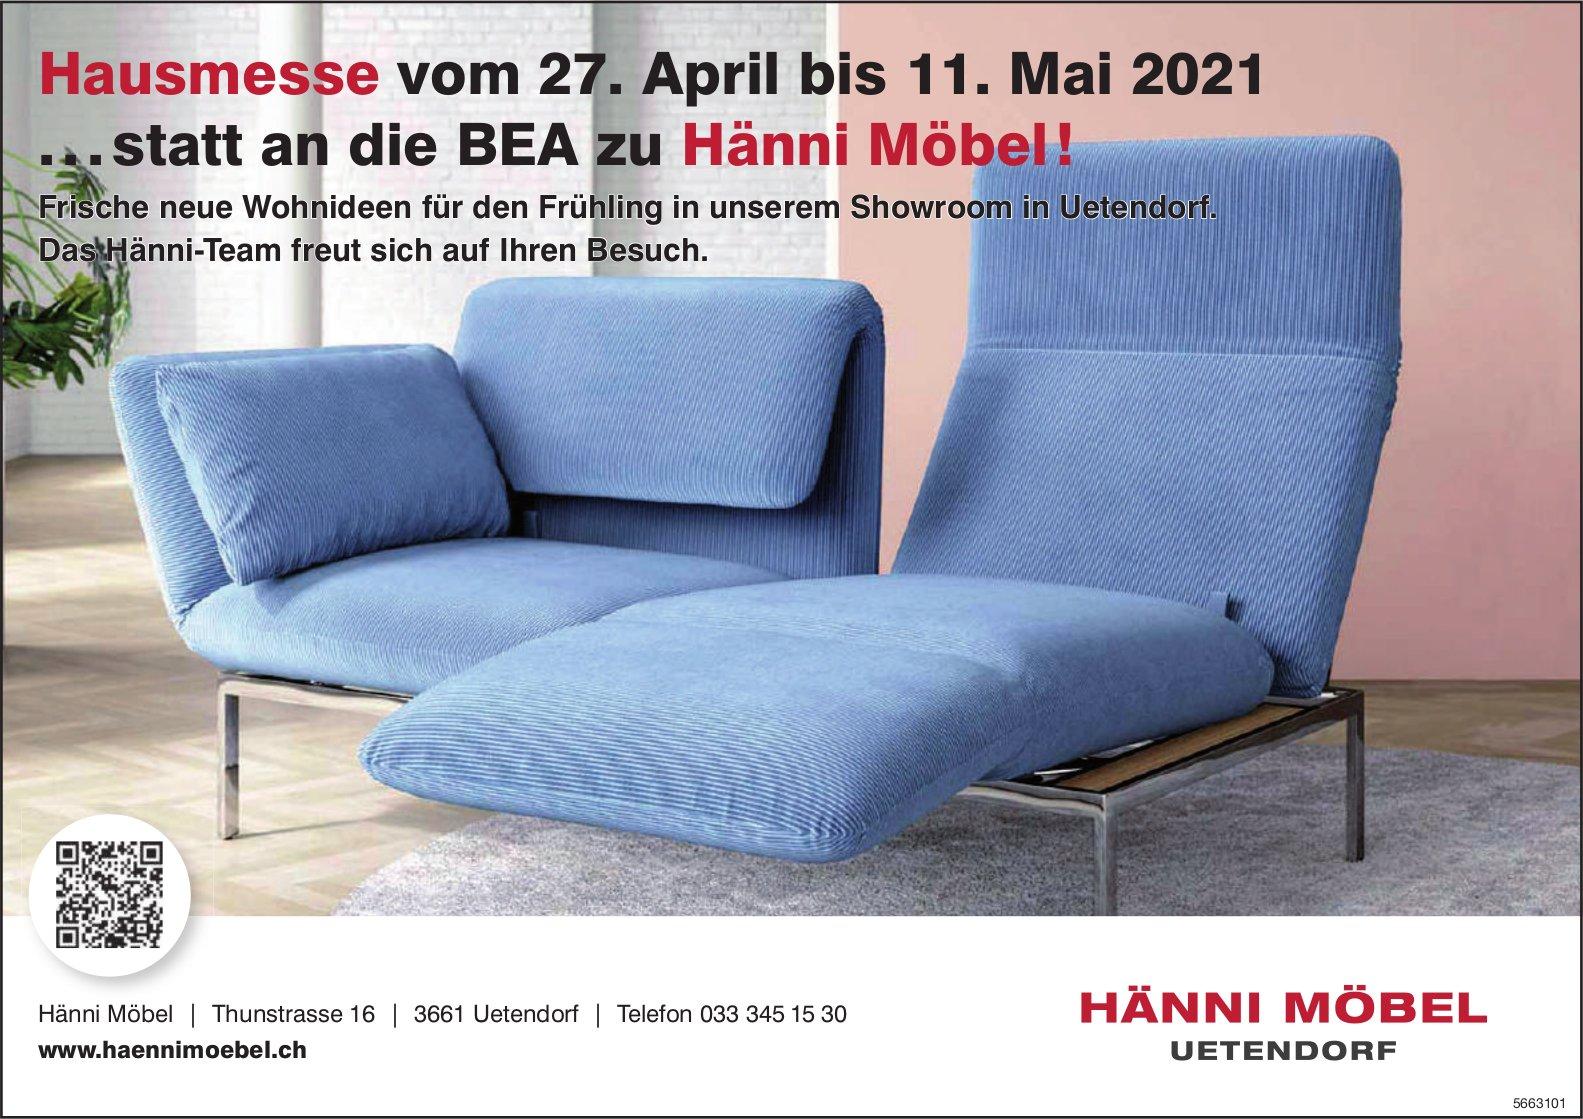 Hausmesse...statt an die BEA, 27. April - 11. Mai, Hänni Möbel, Uetendorf